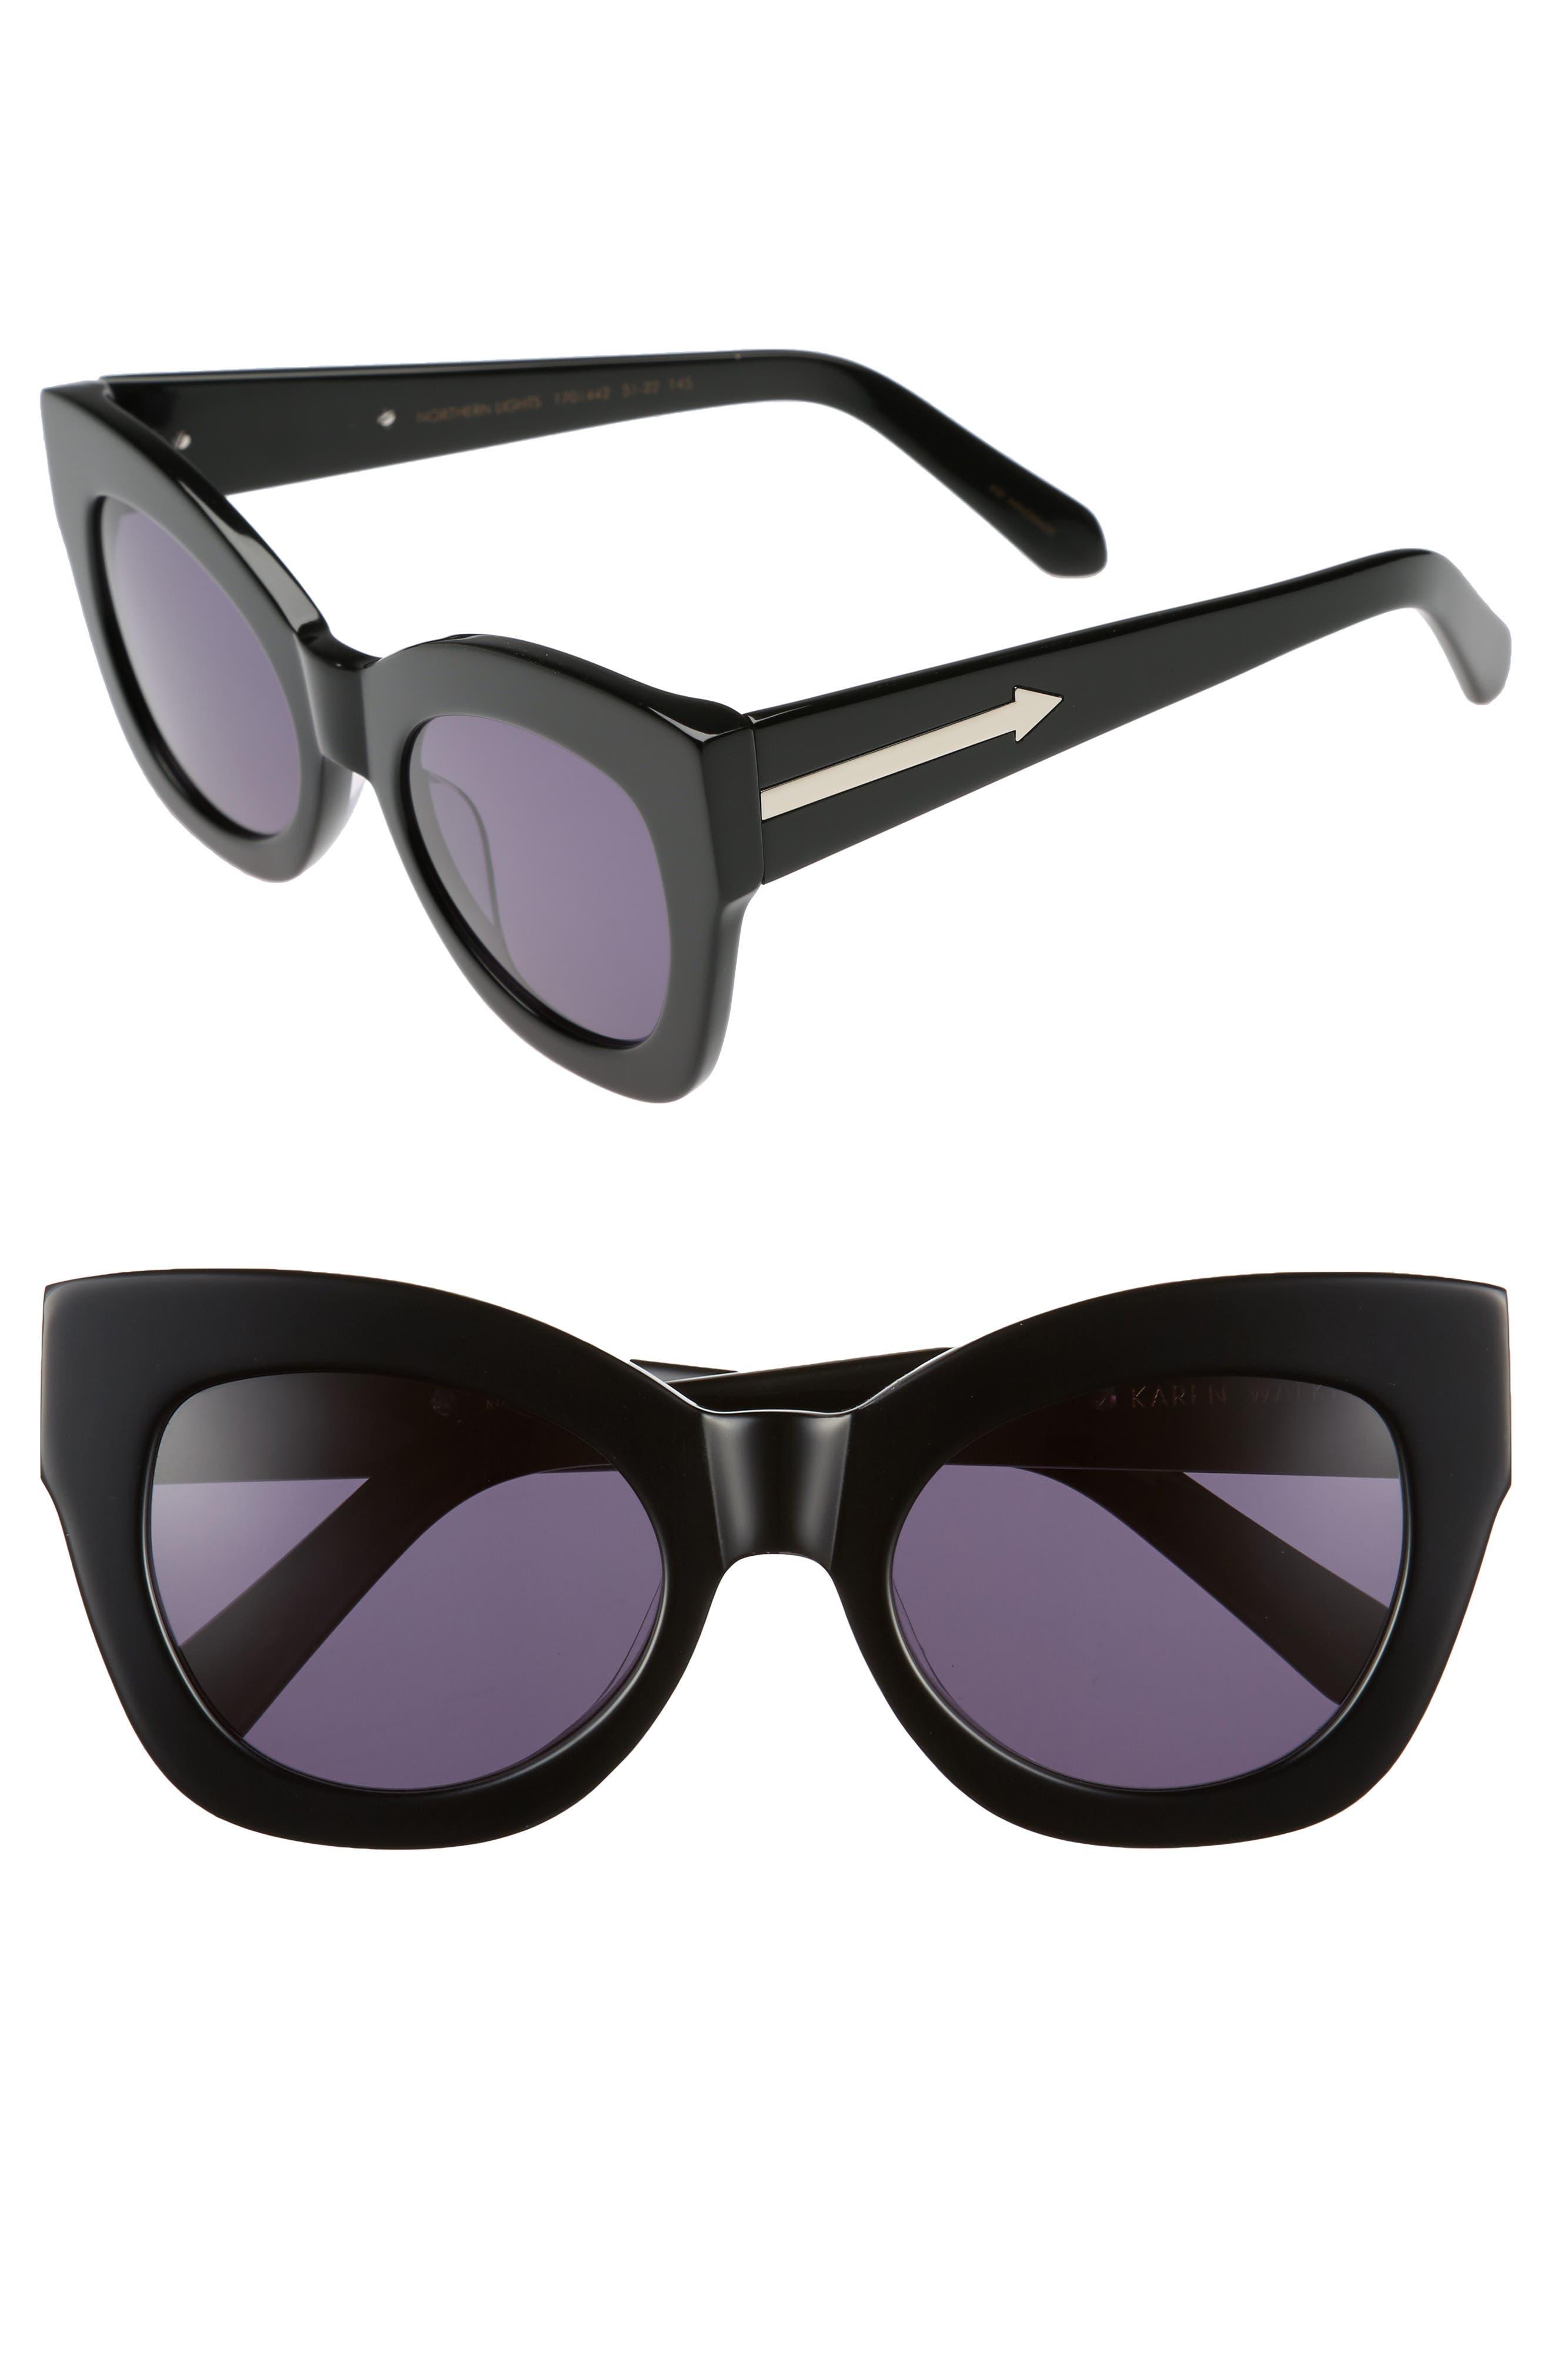 Northern Lights V2 51mm Cat Eye Sunglasses,                         Main,                         color, 001